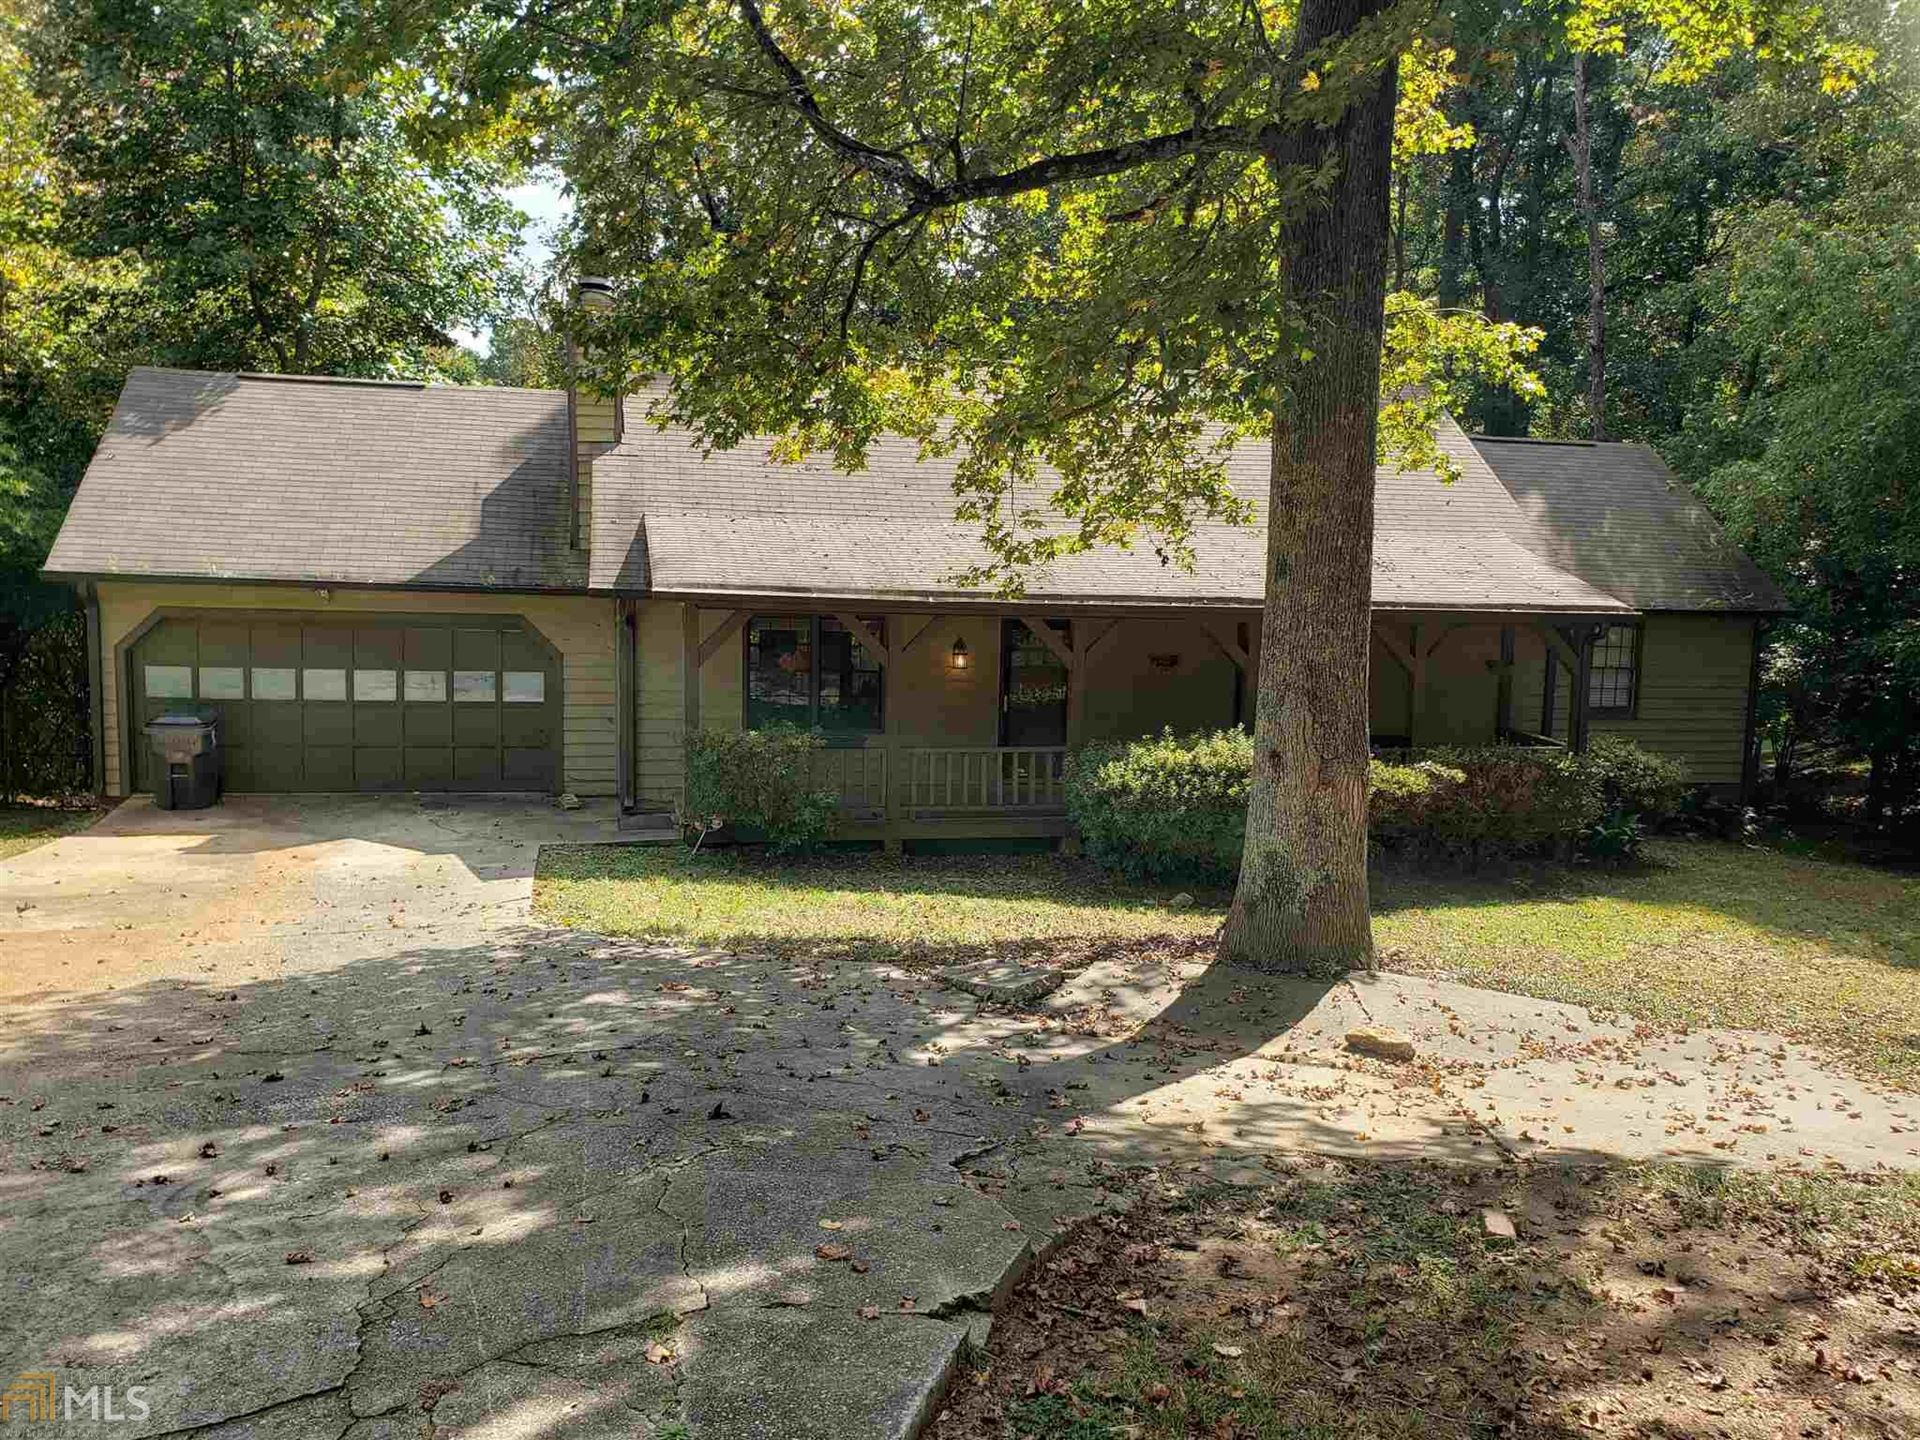 575 Koweeta Trail, Atlanta, GA 30349 - MLS#: 8877759